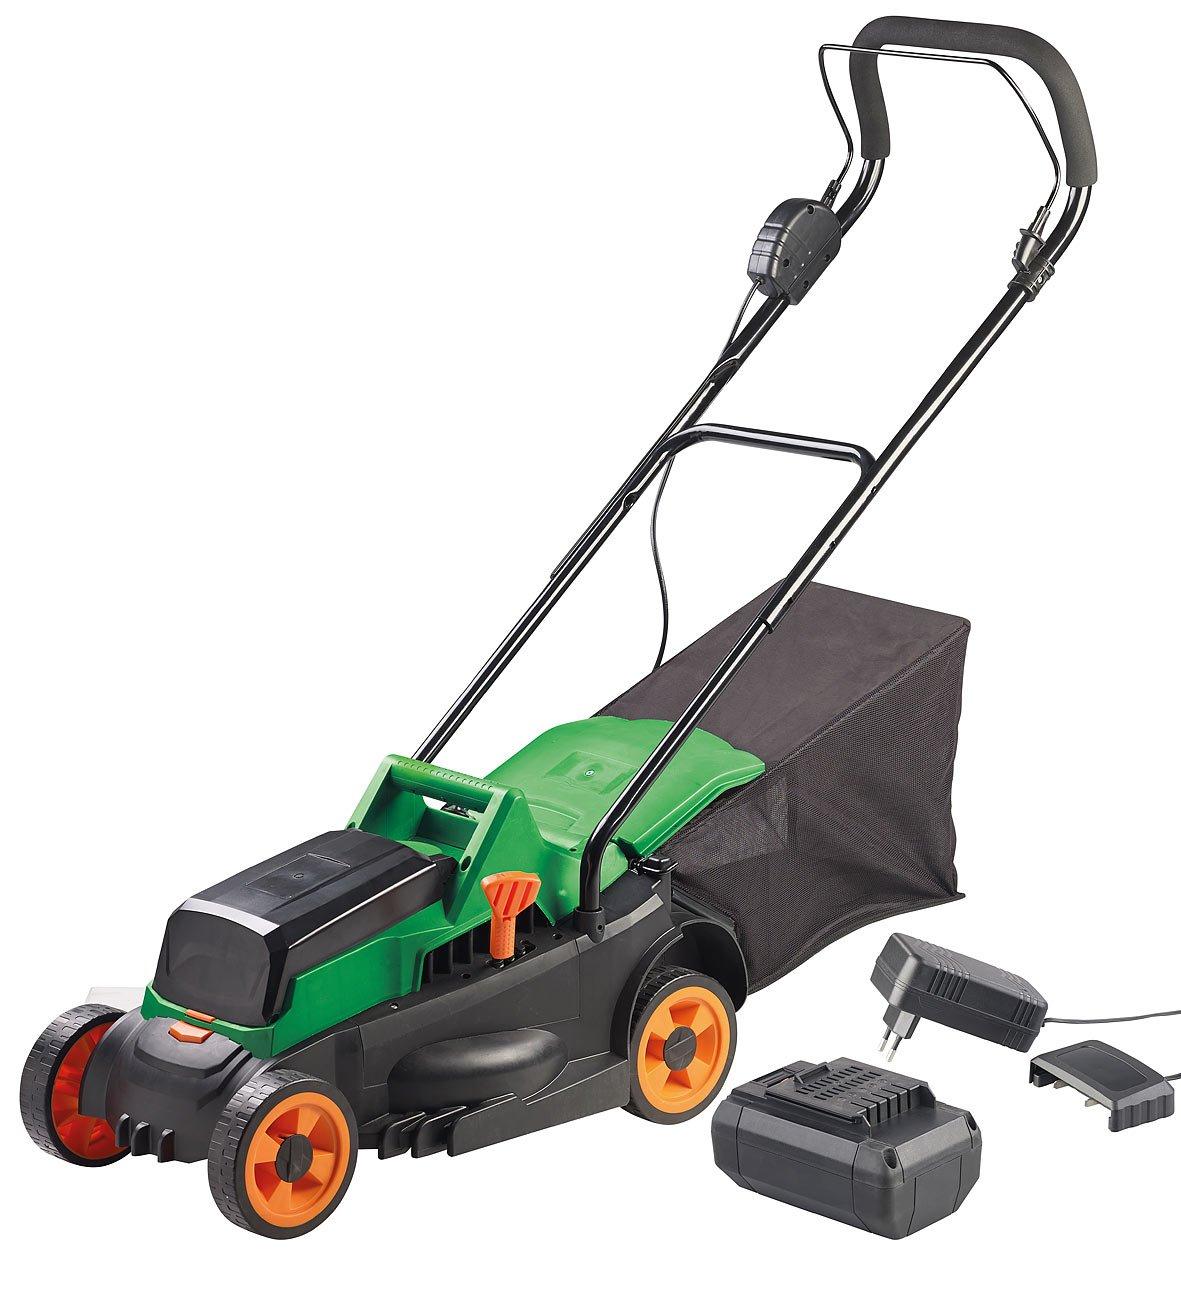 AGT-Professional-Motor-Rasenmher-Akku-Rasenmher-Schnell-Ladegert-4-stufige-Schnitthhe-25-l-4-Ah-Gartenpflege